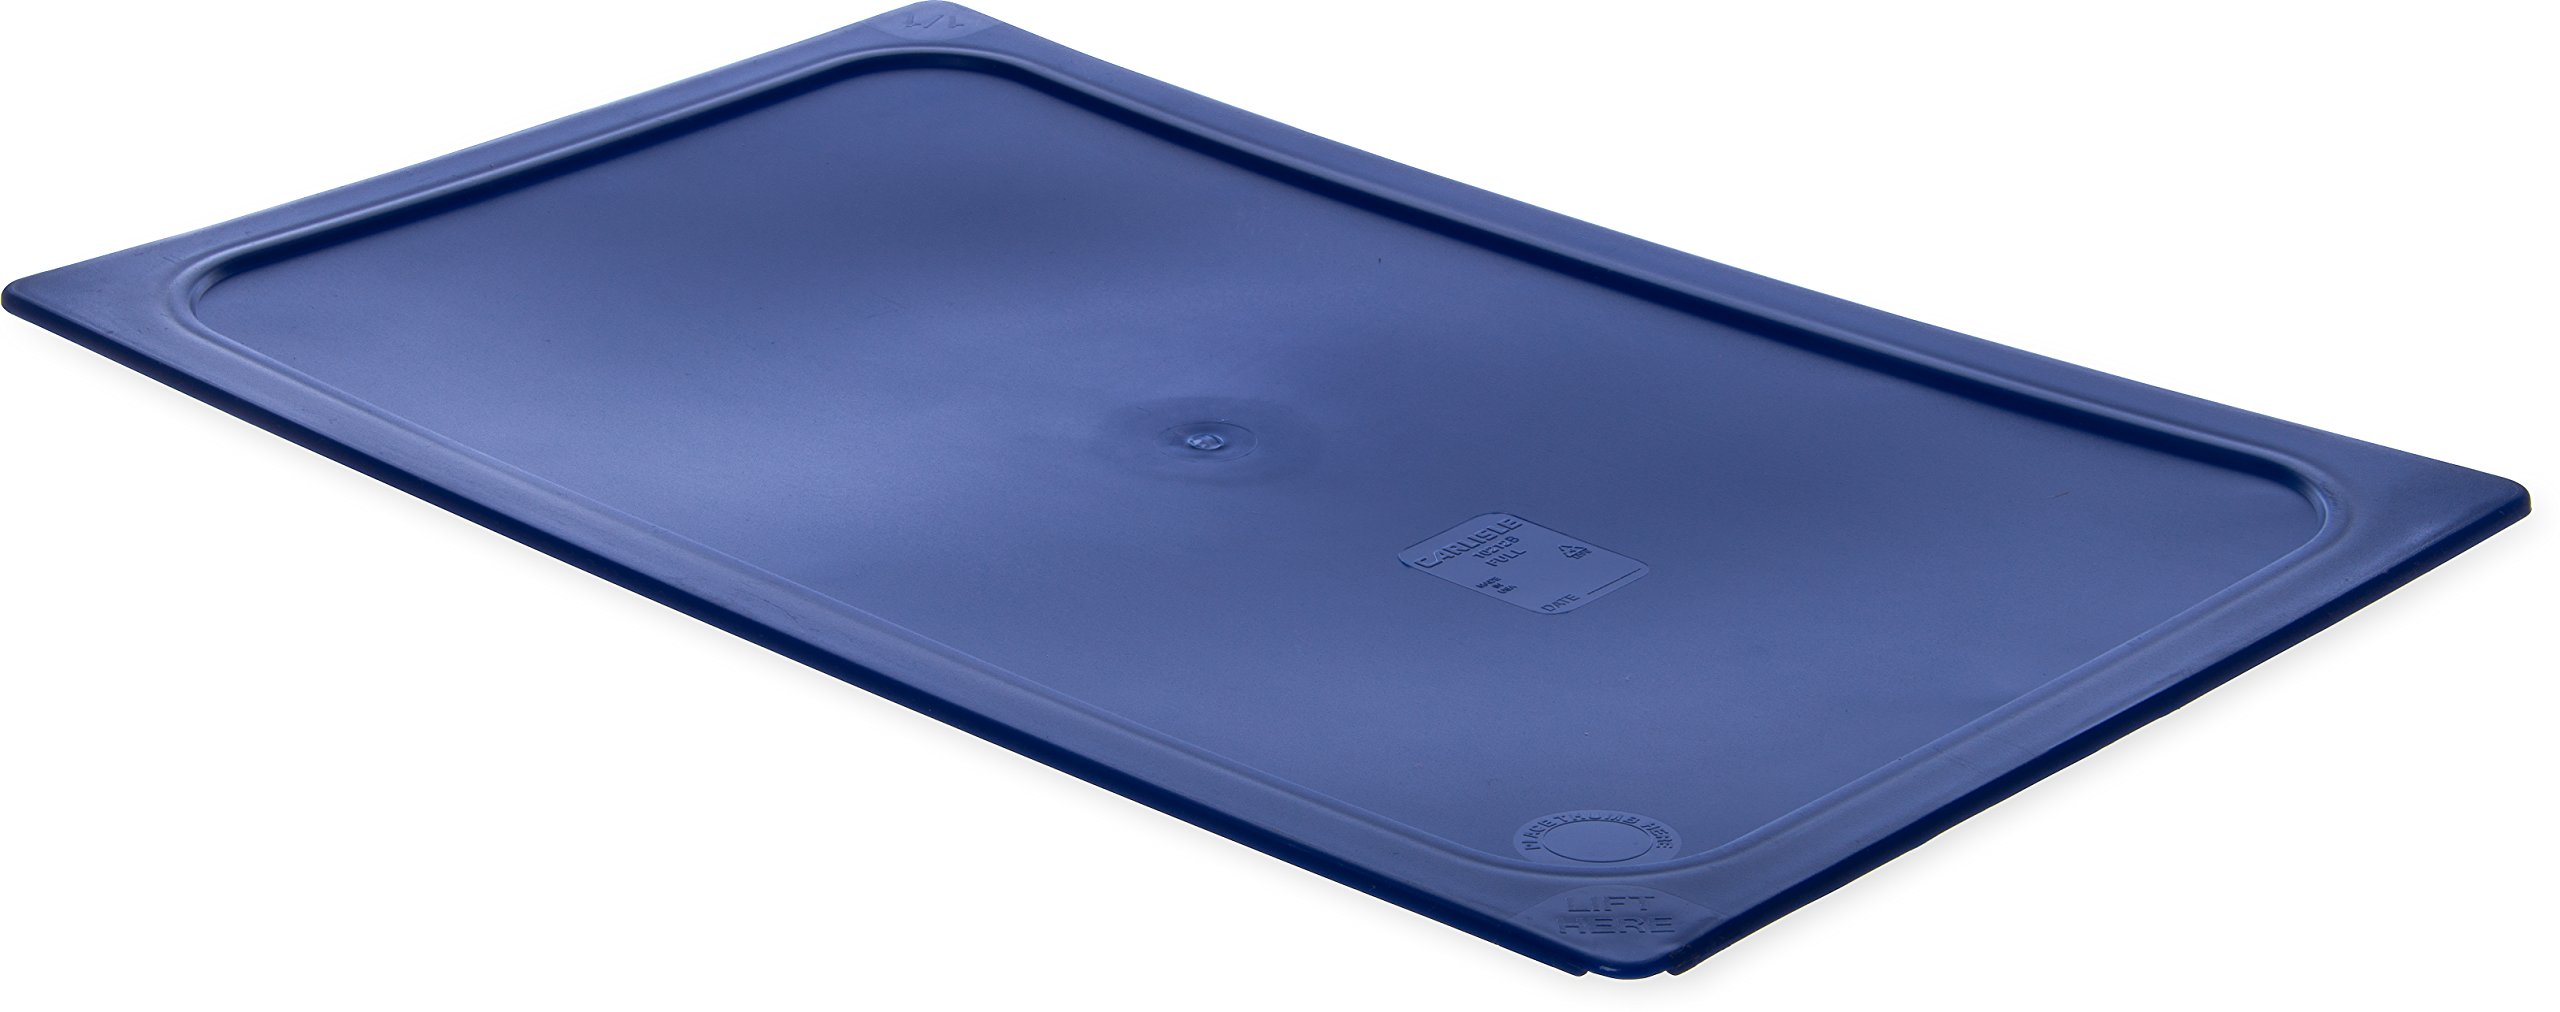 Carlisle 10212B60 Smart Lids Full Size Polyethylene Lid, Dark Blue by Carlisle